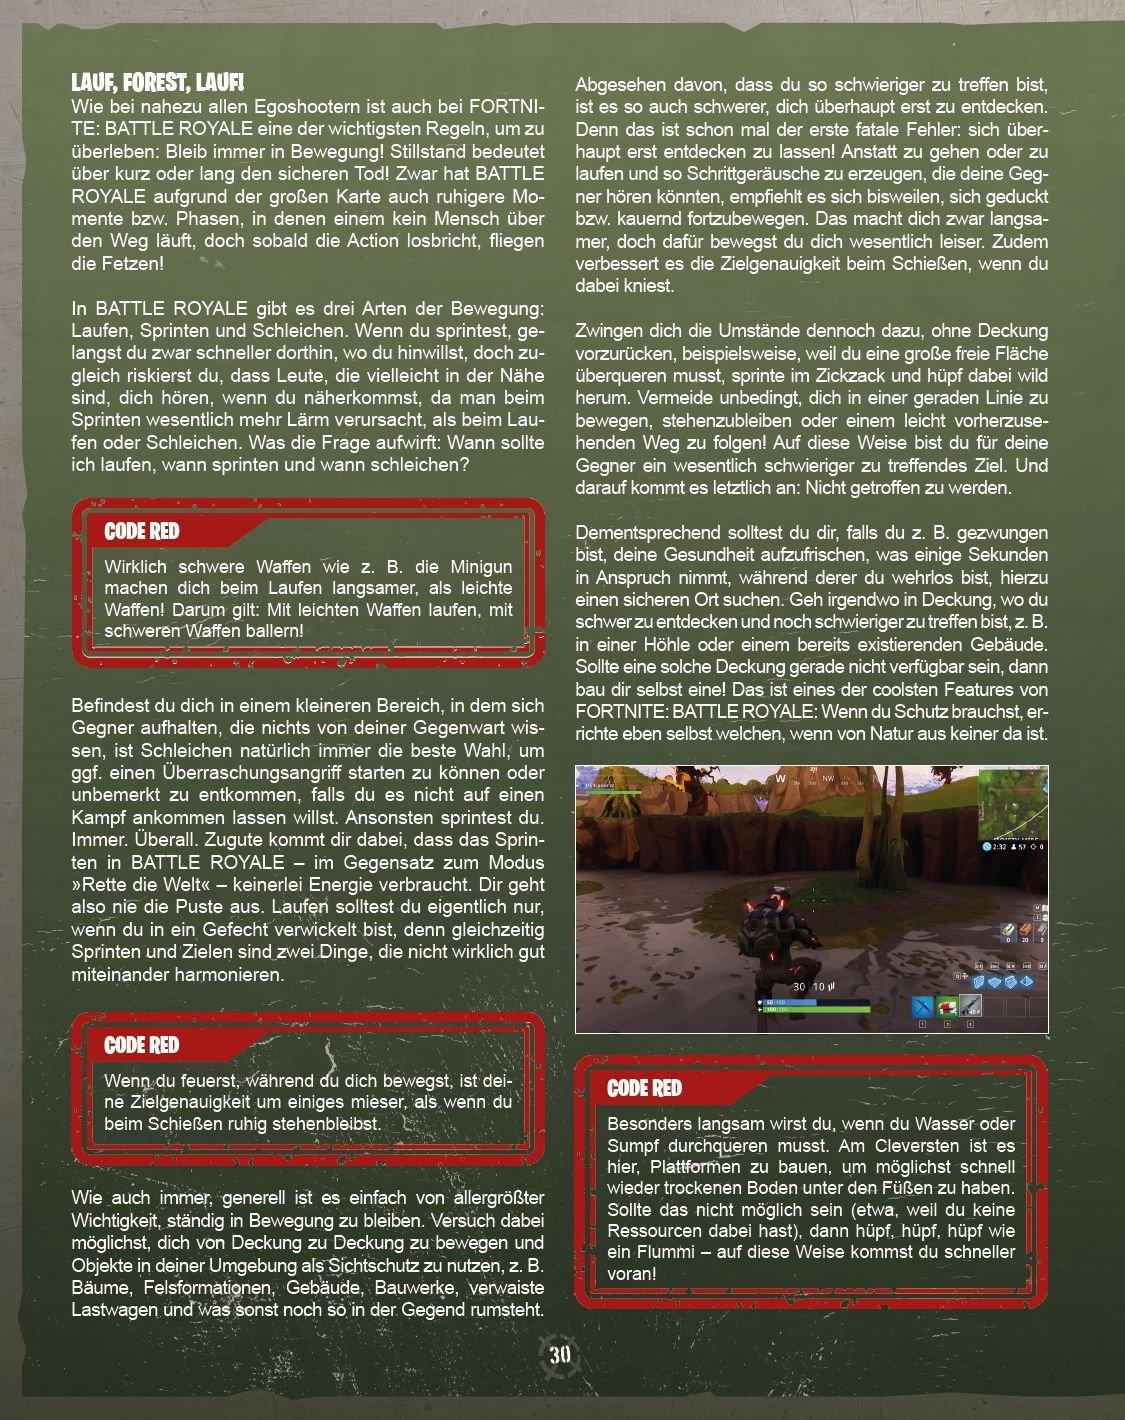 CODE RED: Das ultimative inoffizielle Strategiebuch zu Fortnite ...